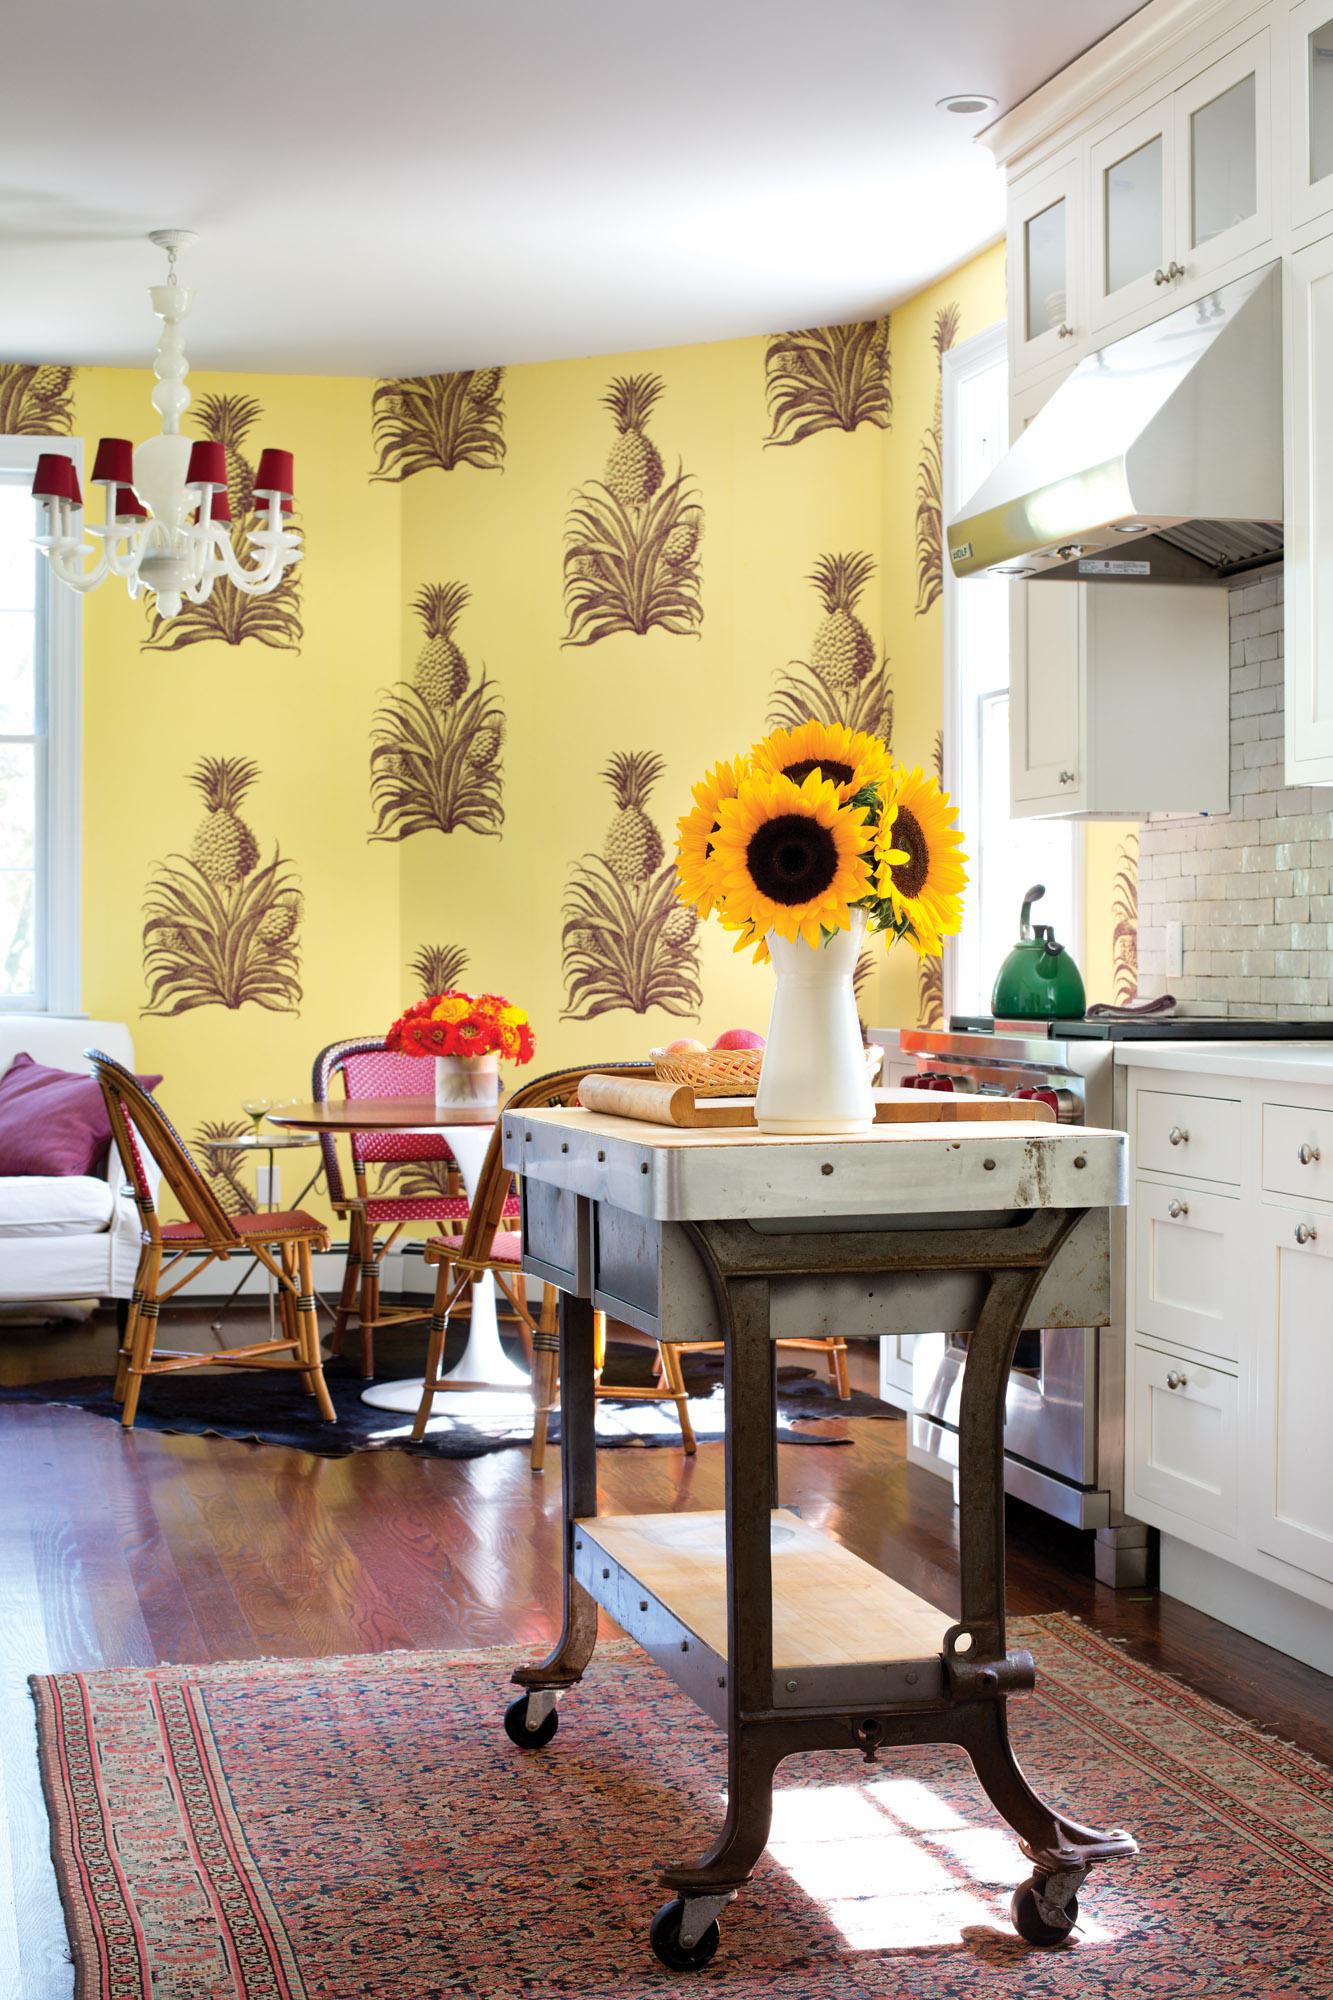 pineapple-patterend wallpaper